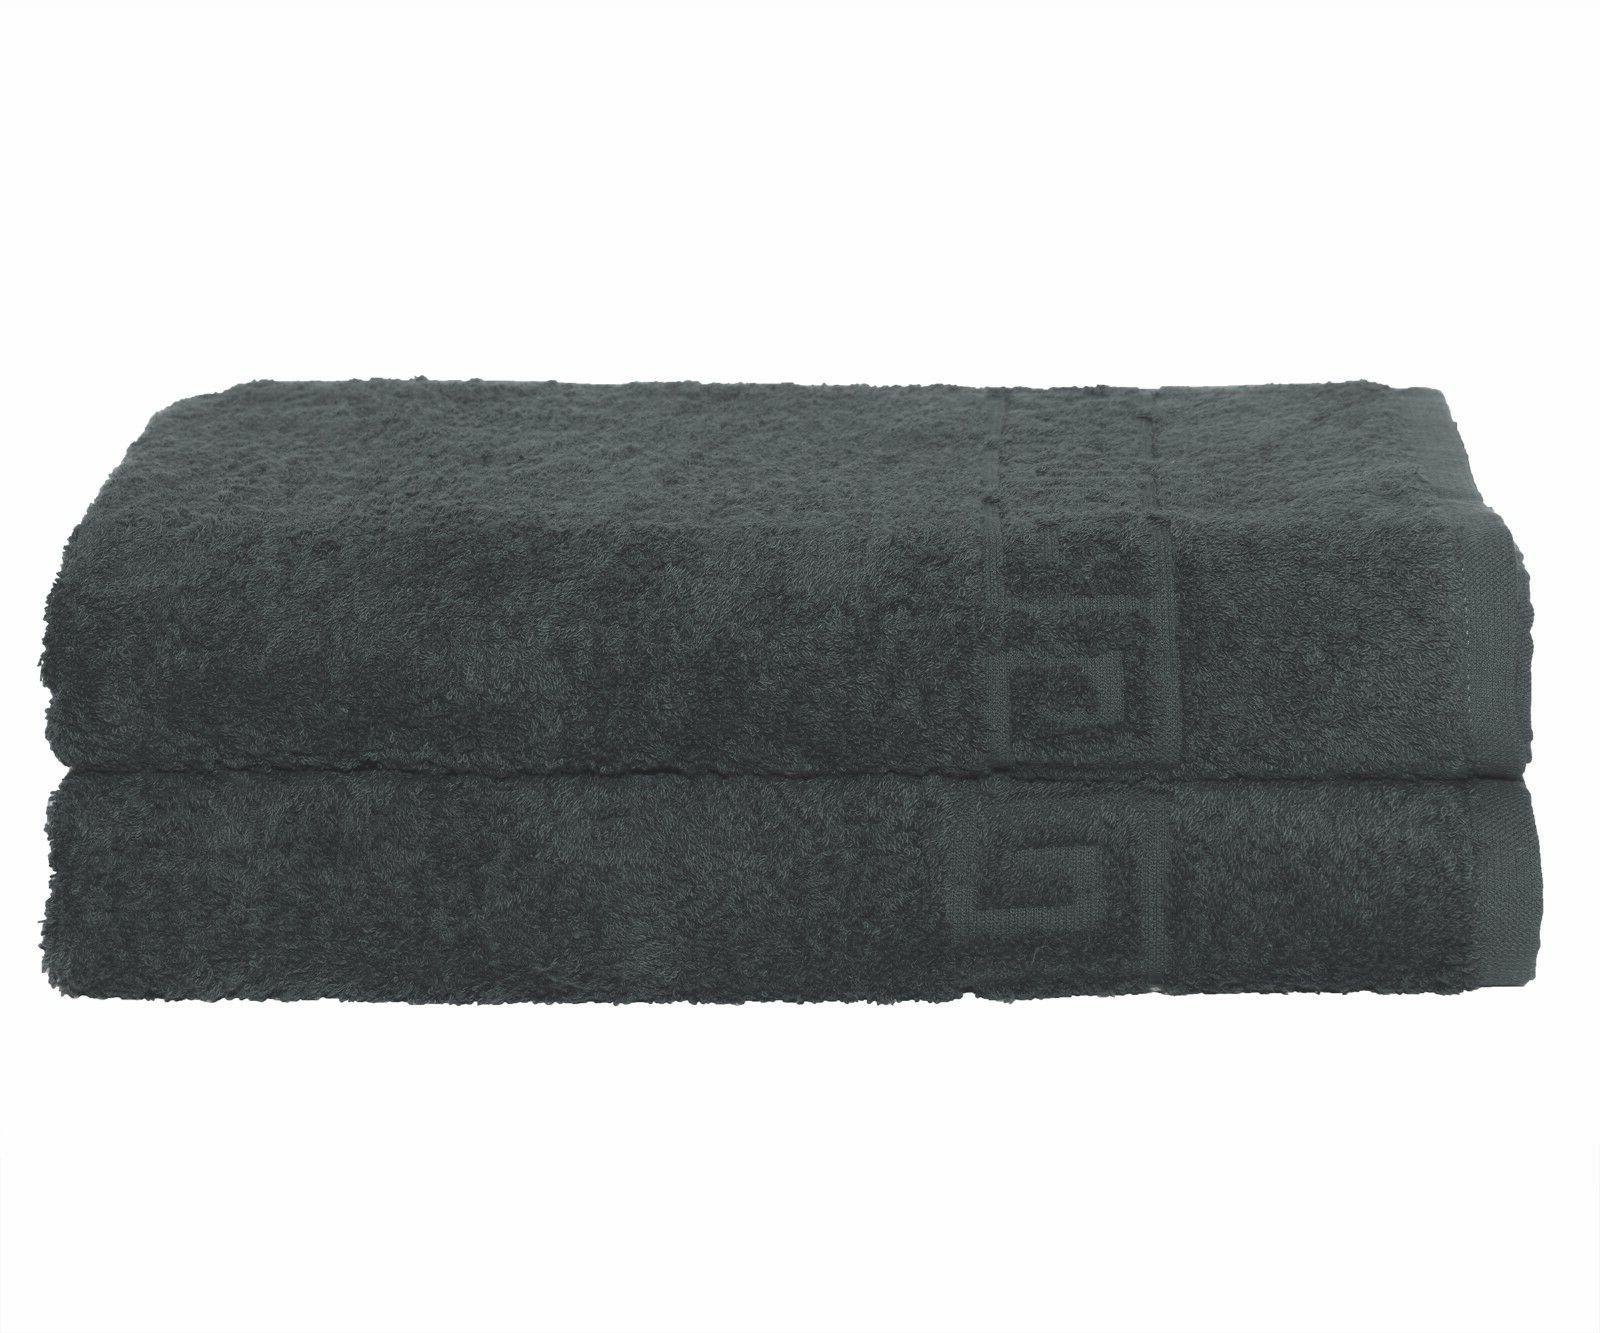 Towels Set 2 Bath or 2 Hand Towels